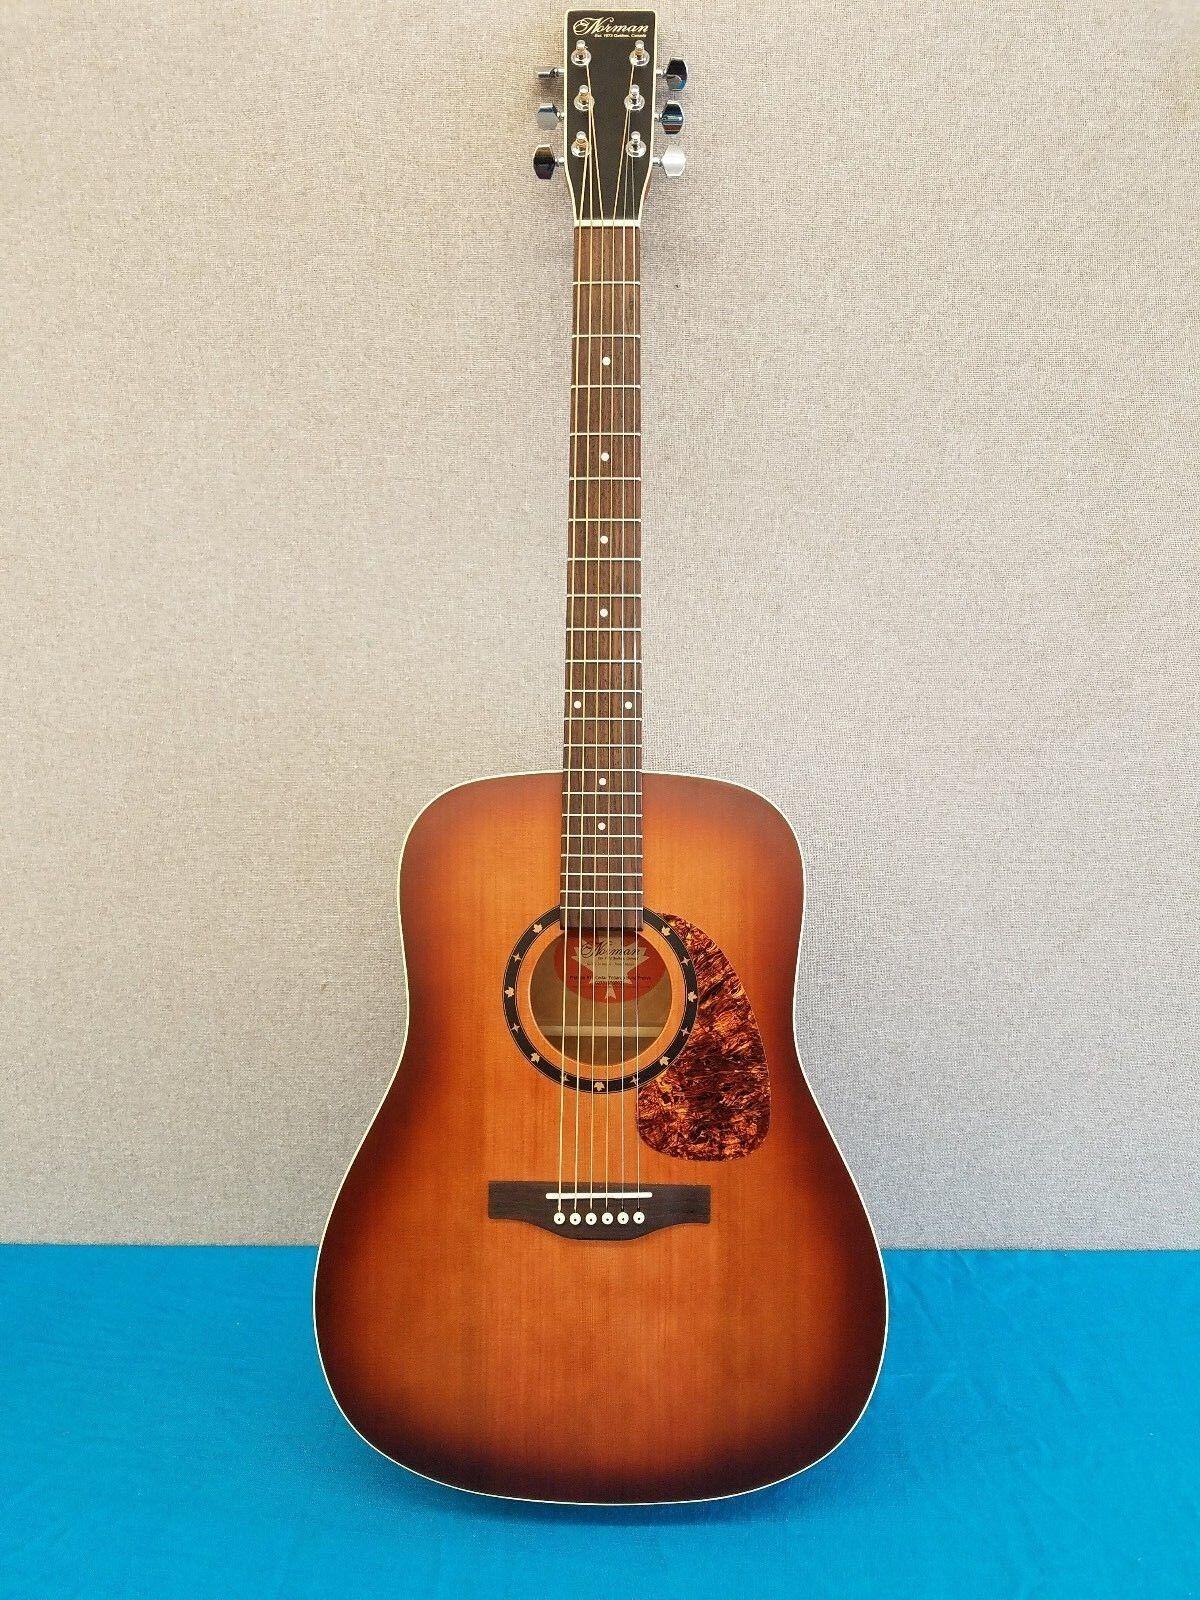 New Norman Protoge B18 Cedar Tobacco Burst Acoustic Electric Guitar w/Gig Bag